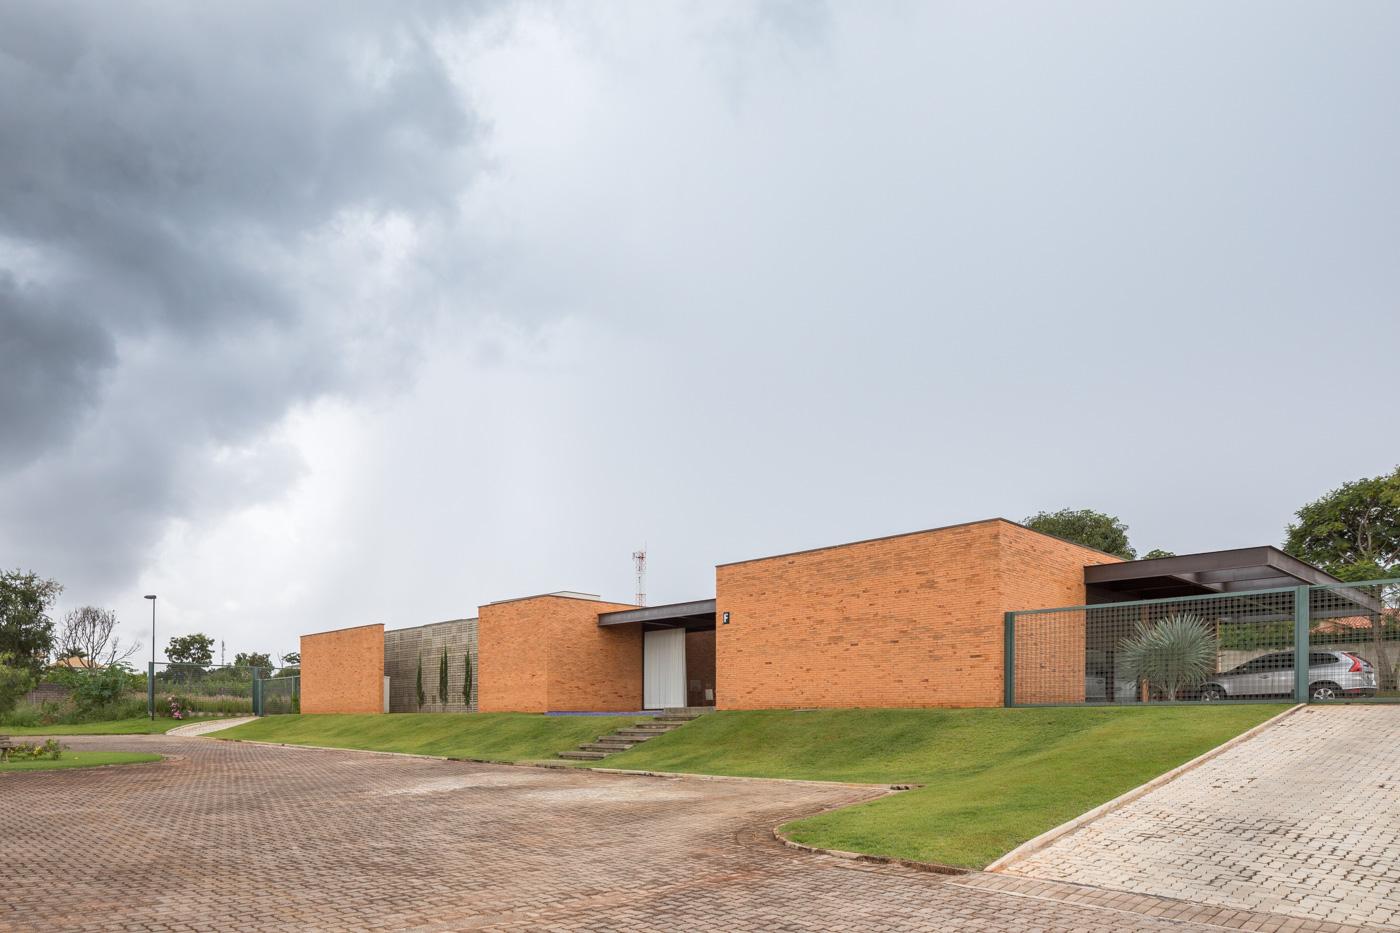 Estúdio-Mova-arquitetura-interiores-comercial-foto-haruo-mikami_007_Baixa.jpg